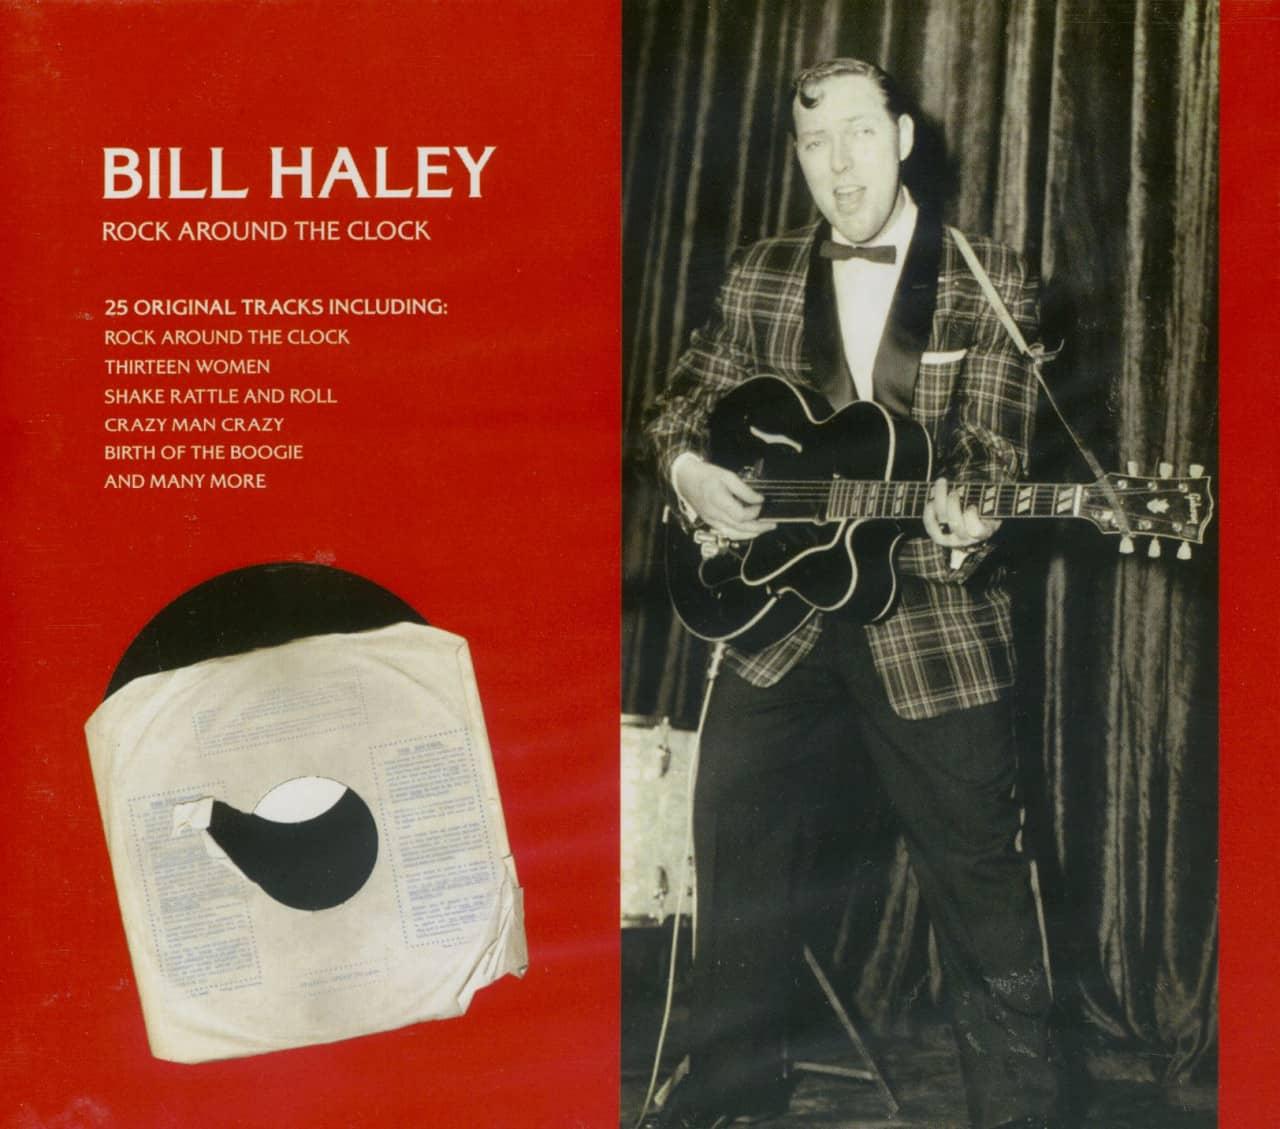 Bill Haley & His Comets - Rock Around the Clock (CD)